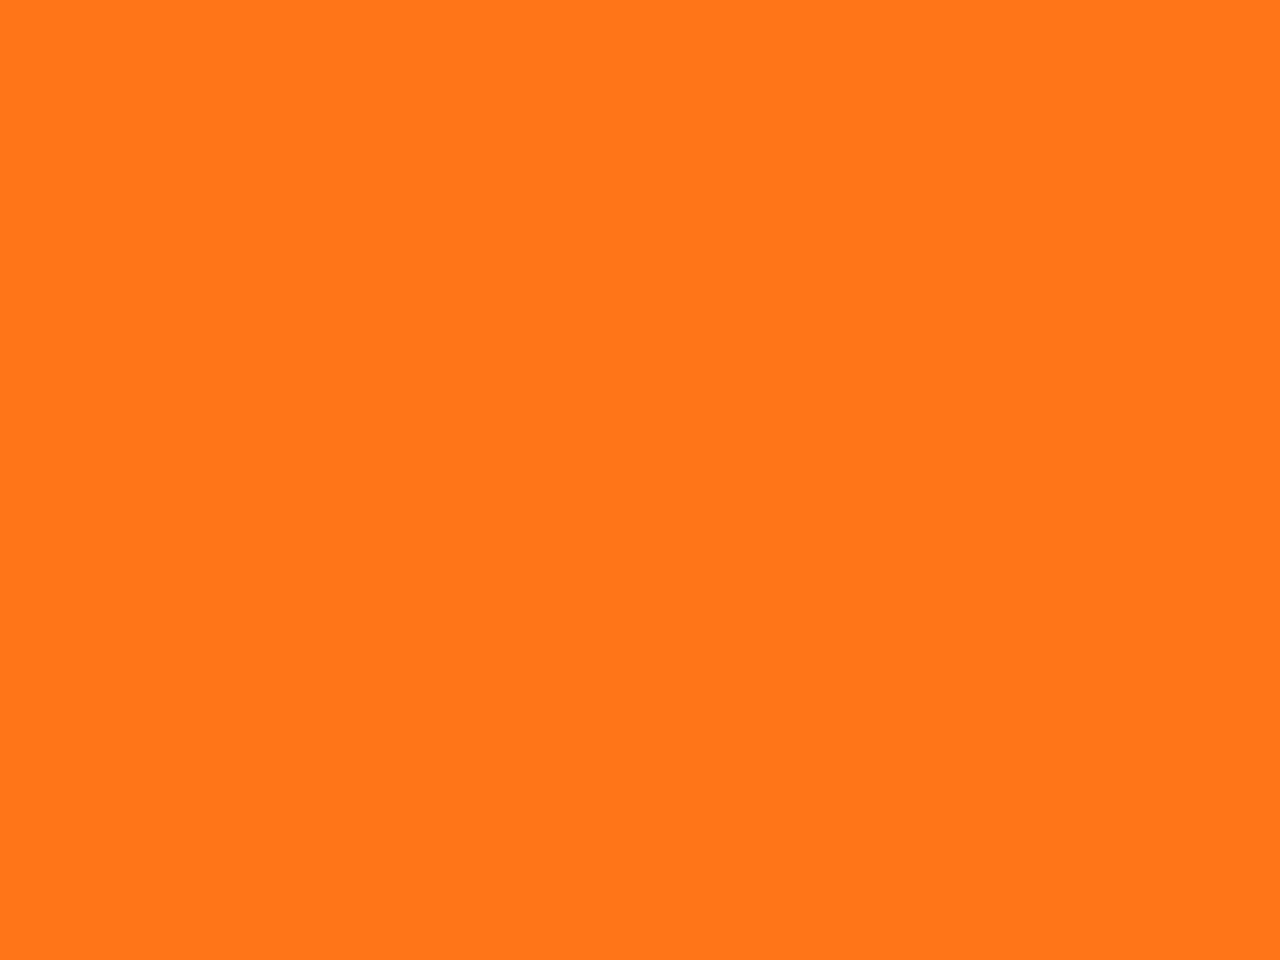 1280x960 Pumpkin Solid Color Background